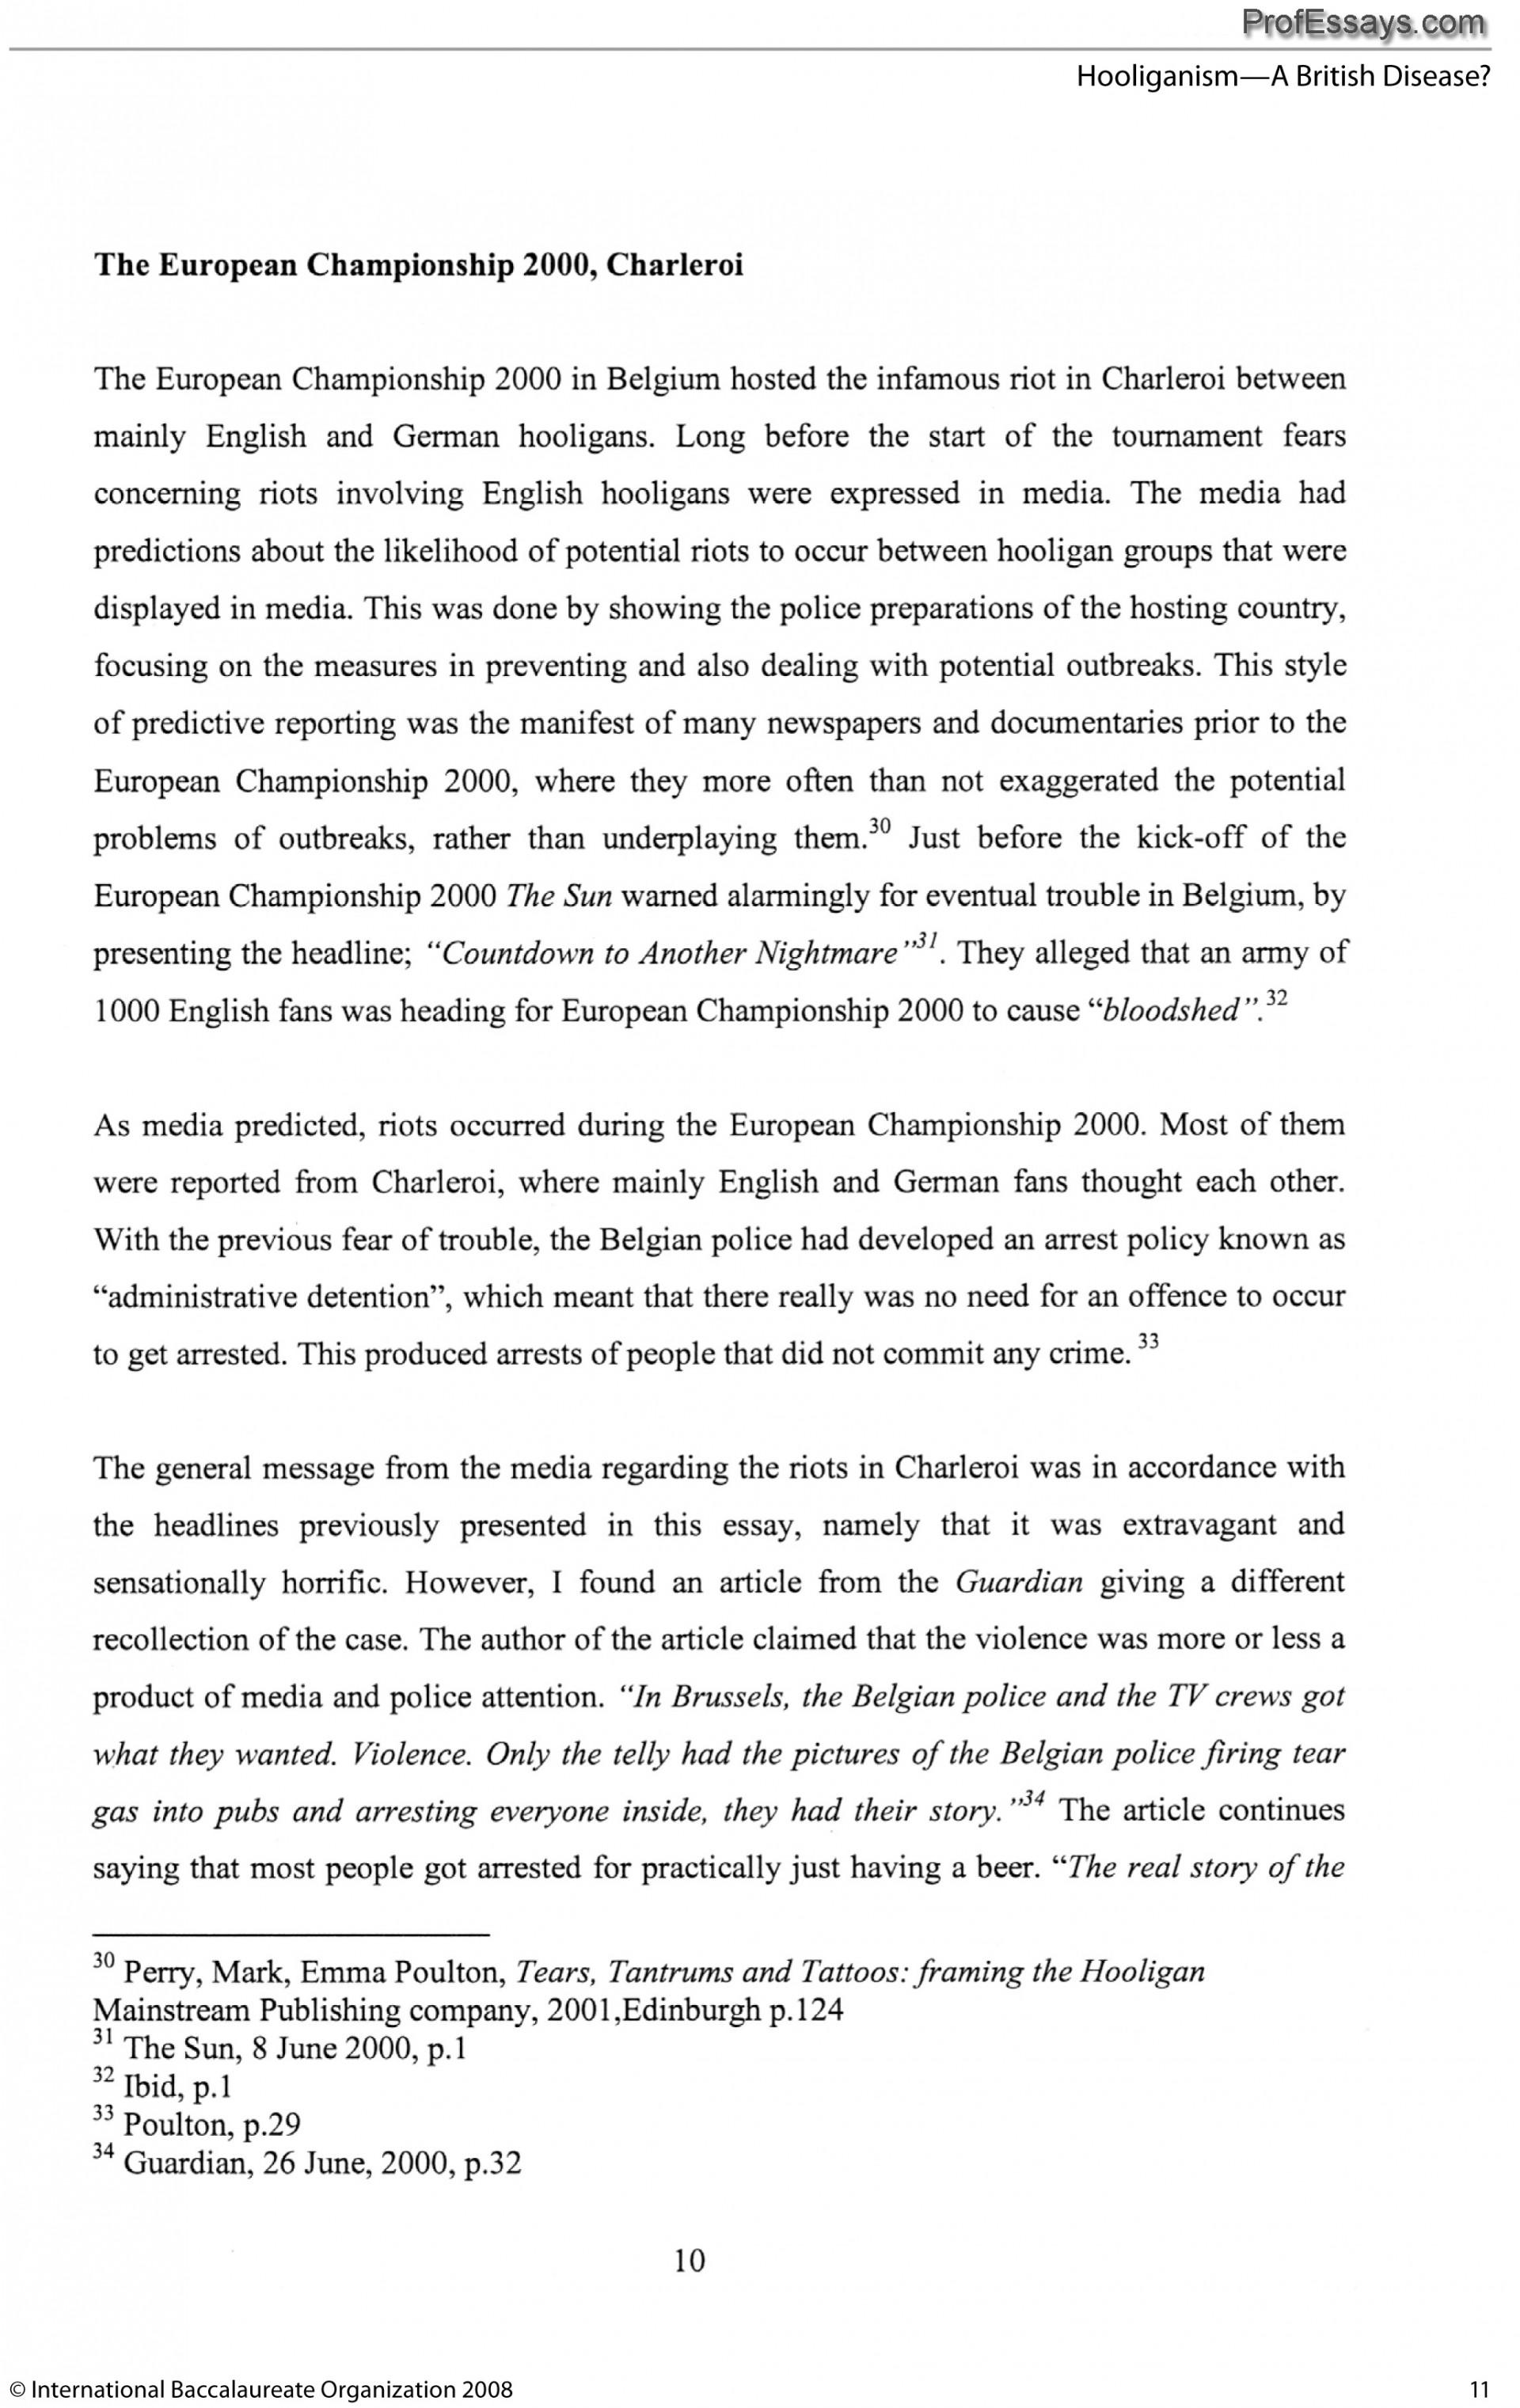 021 Writing Help Sample Essay Toefl Topics Dreaded 2017 185 Pdf Ets 1920